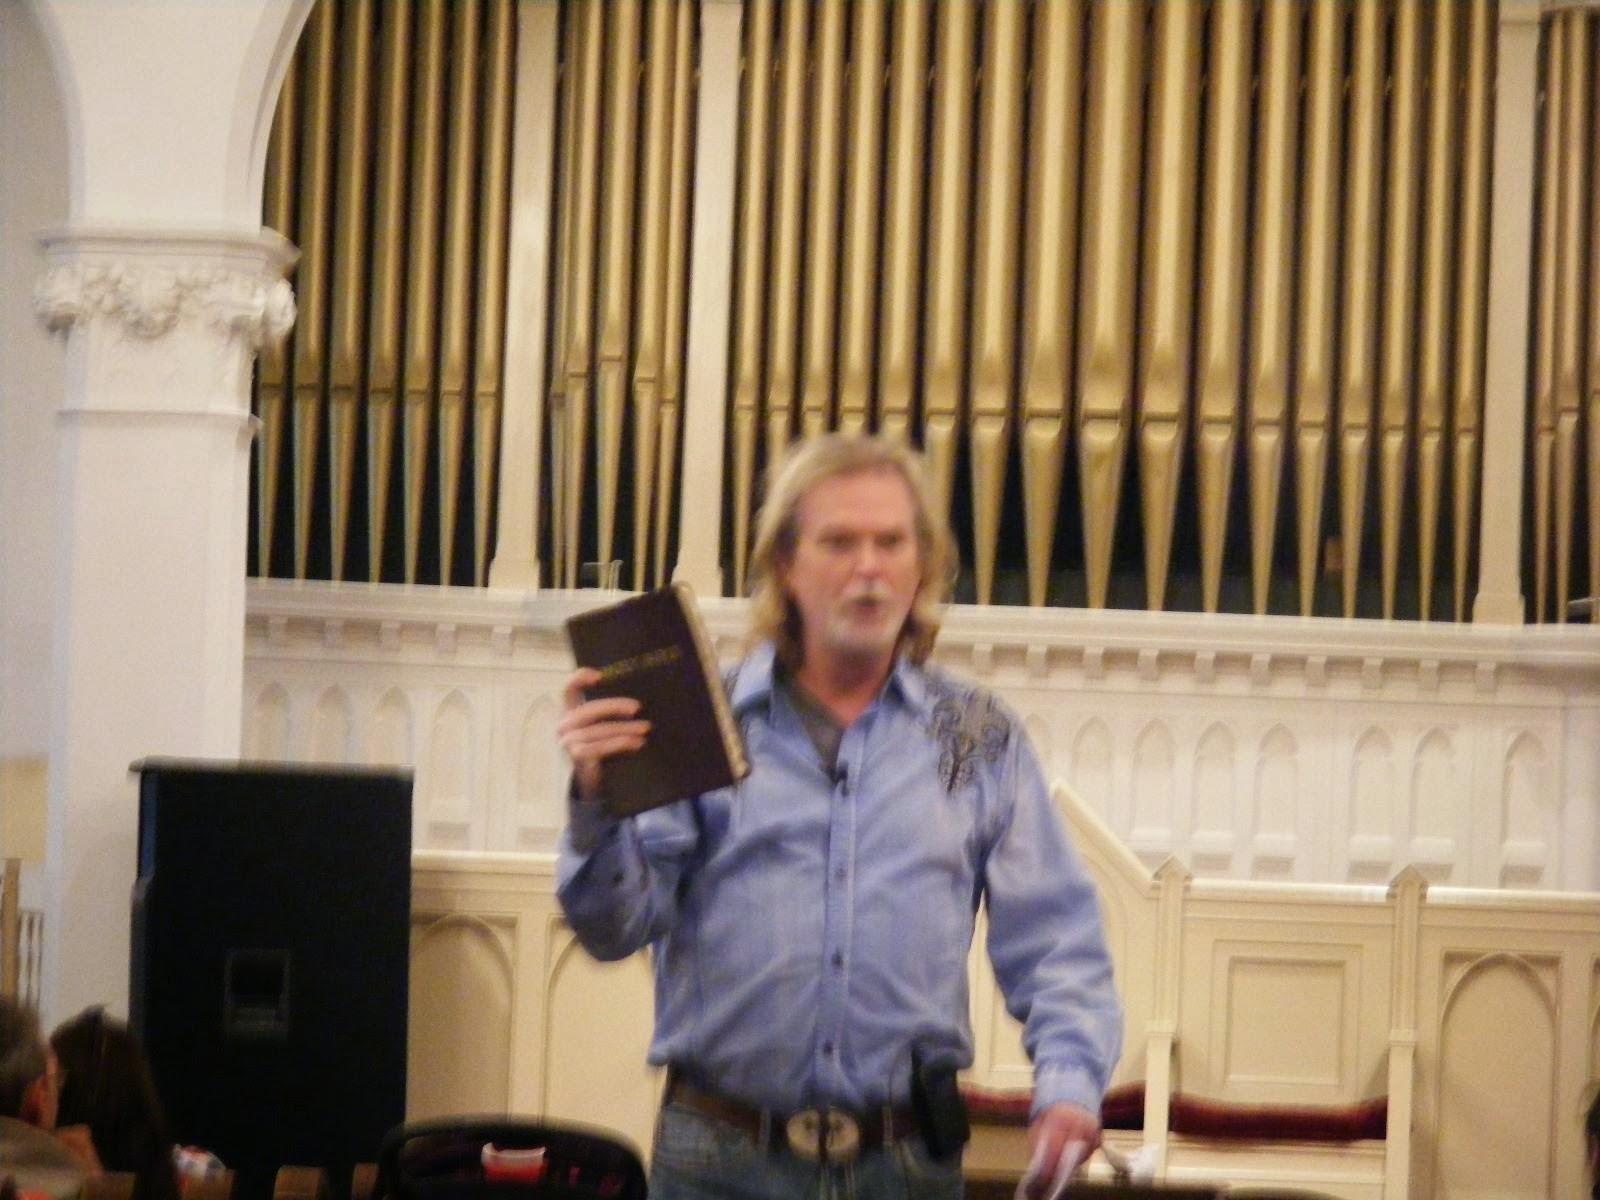 Pastor John Collins